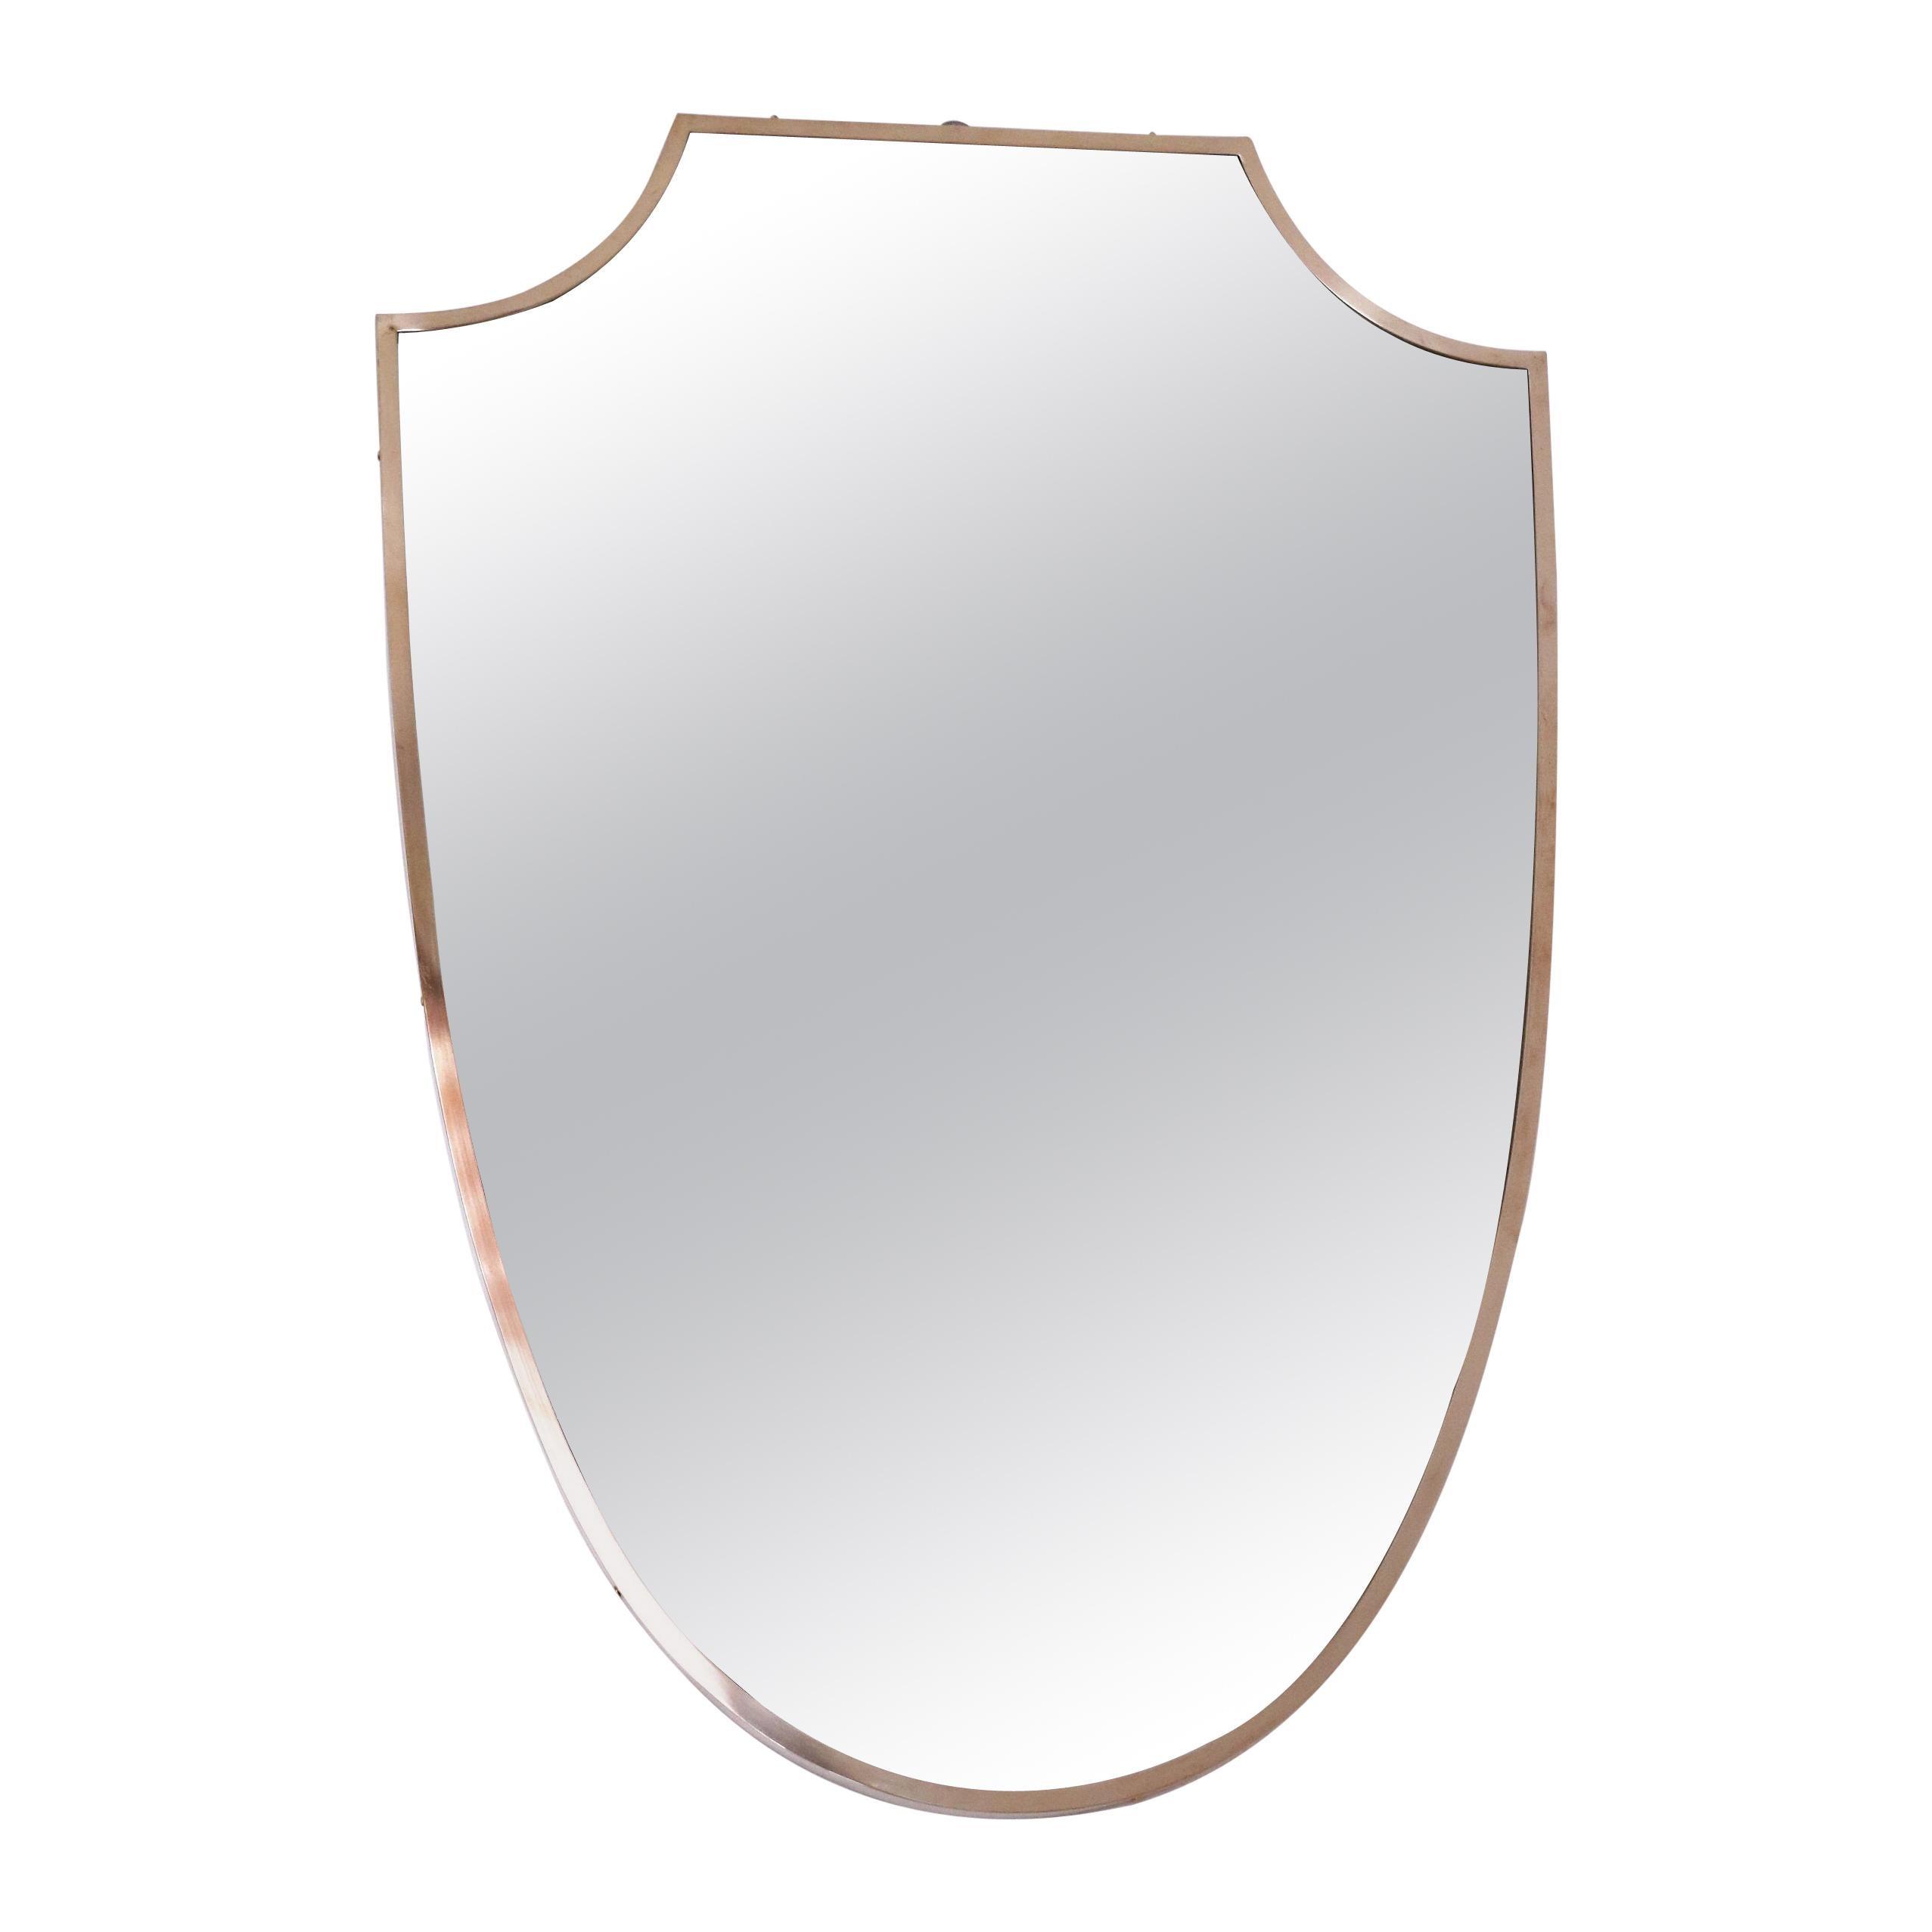 Italian Midcentury Brass Wall Mirror Shield Shape, 1950s